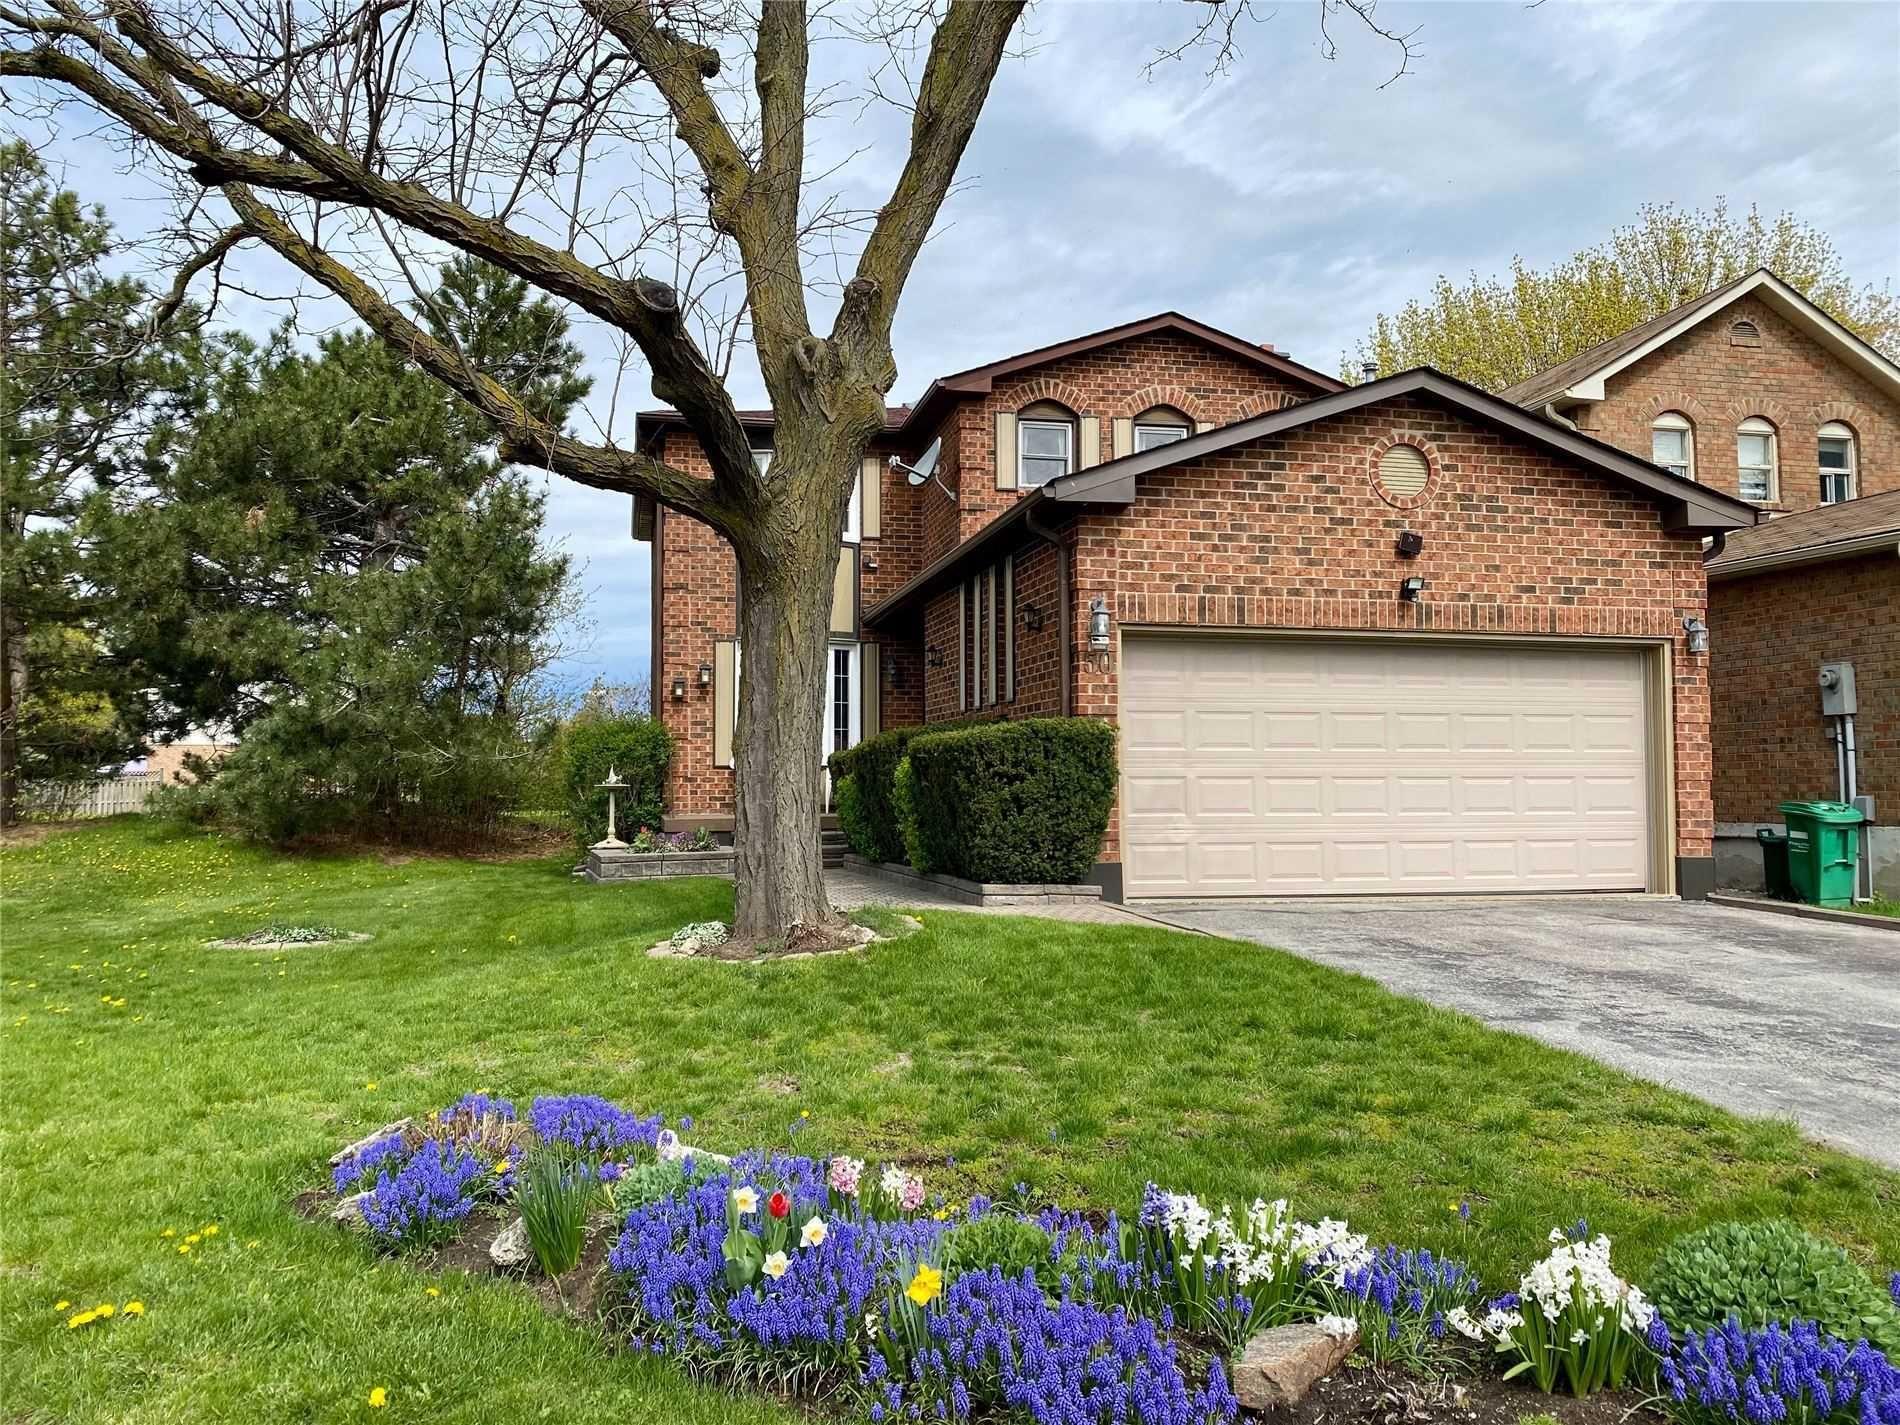 Main Photo: 50 Oleander Crescent in Brampton: Heart Lake East House (2-Storey) for sale : MLS®# W5217331